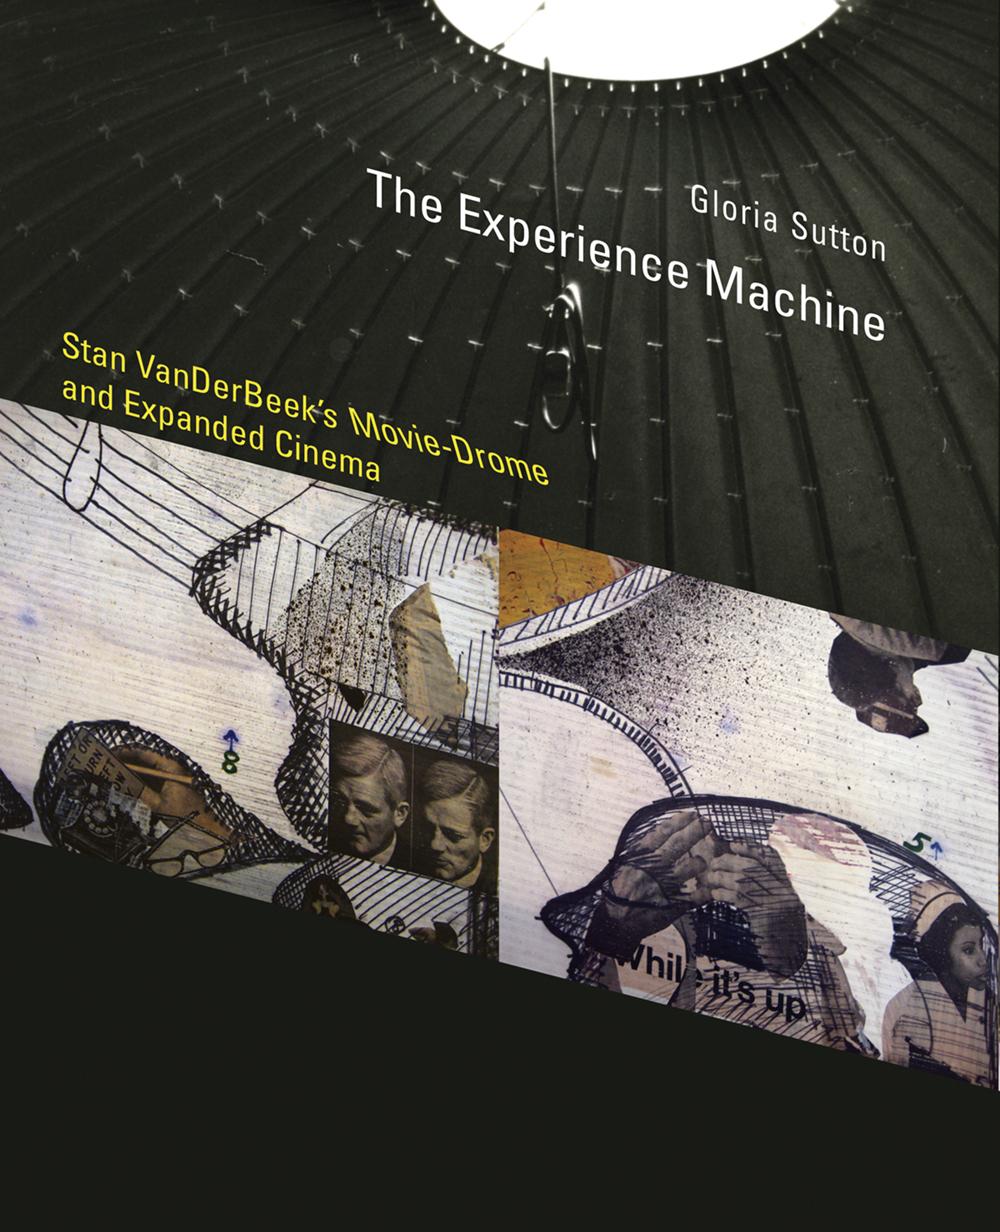 Buy The Experience Machine: Stan Vanderbeek's Movie-Drome and Expanded Cinema